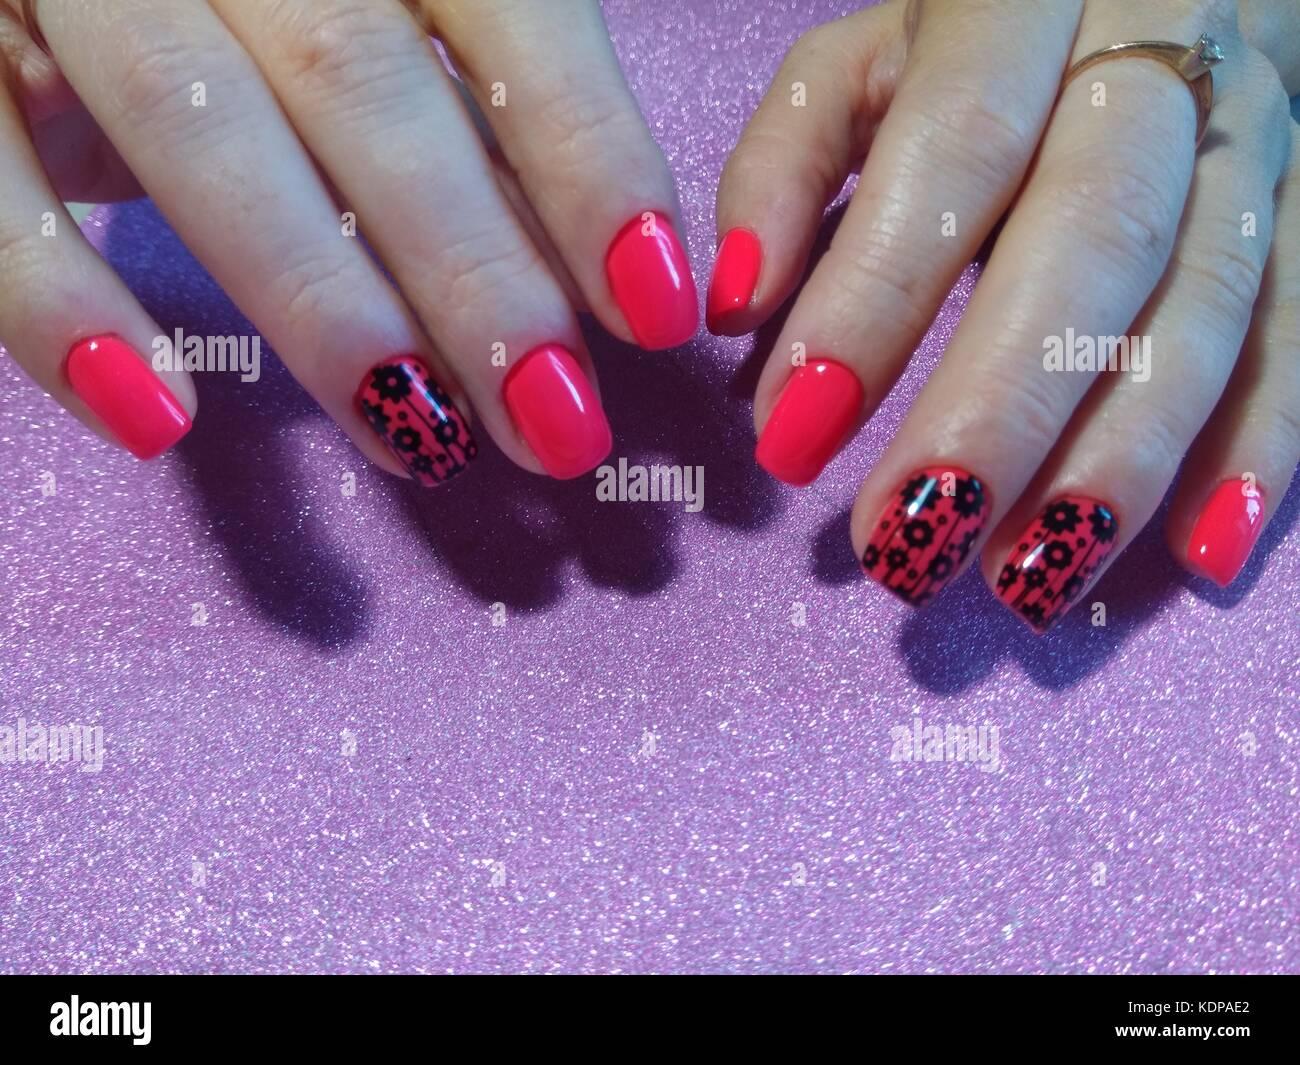 Nail art design. Nail Polish. Beauty hands. Trendy Stylish Colorful ...